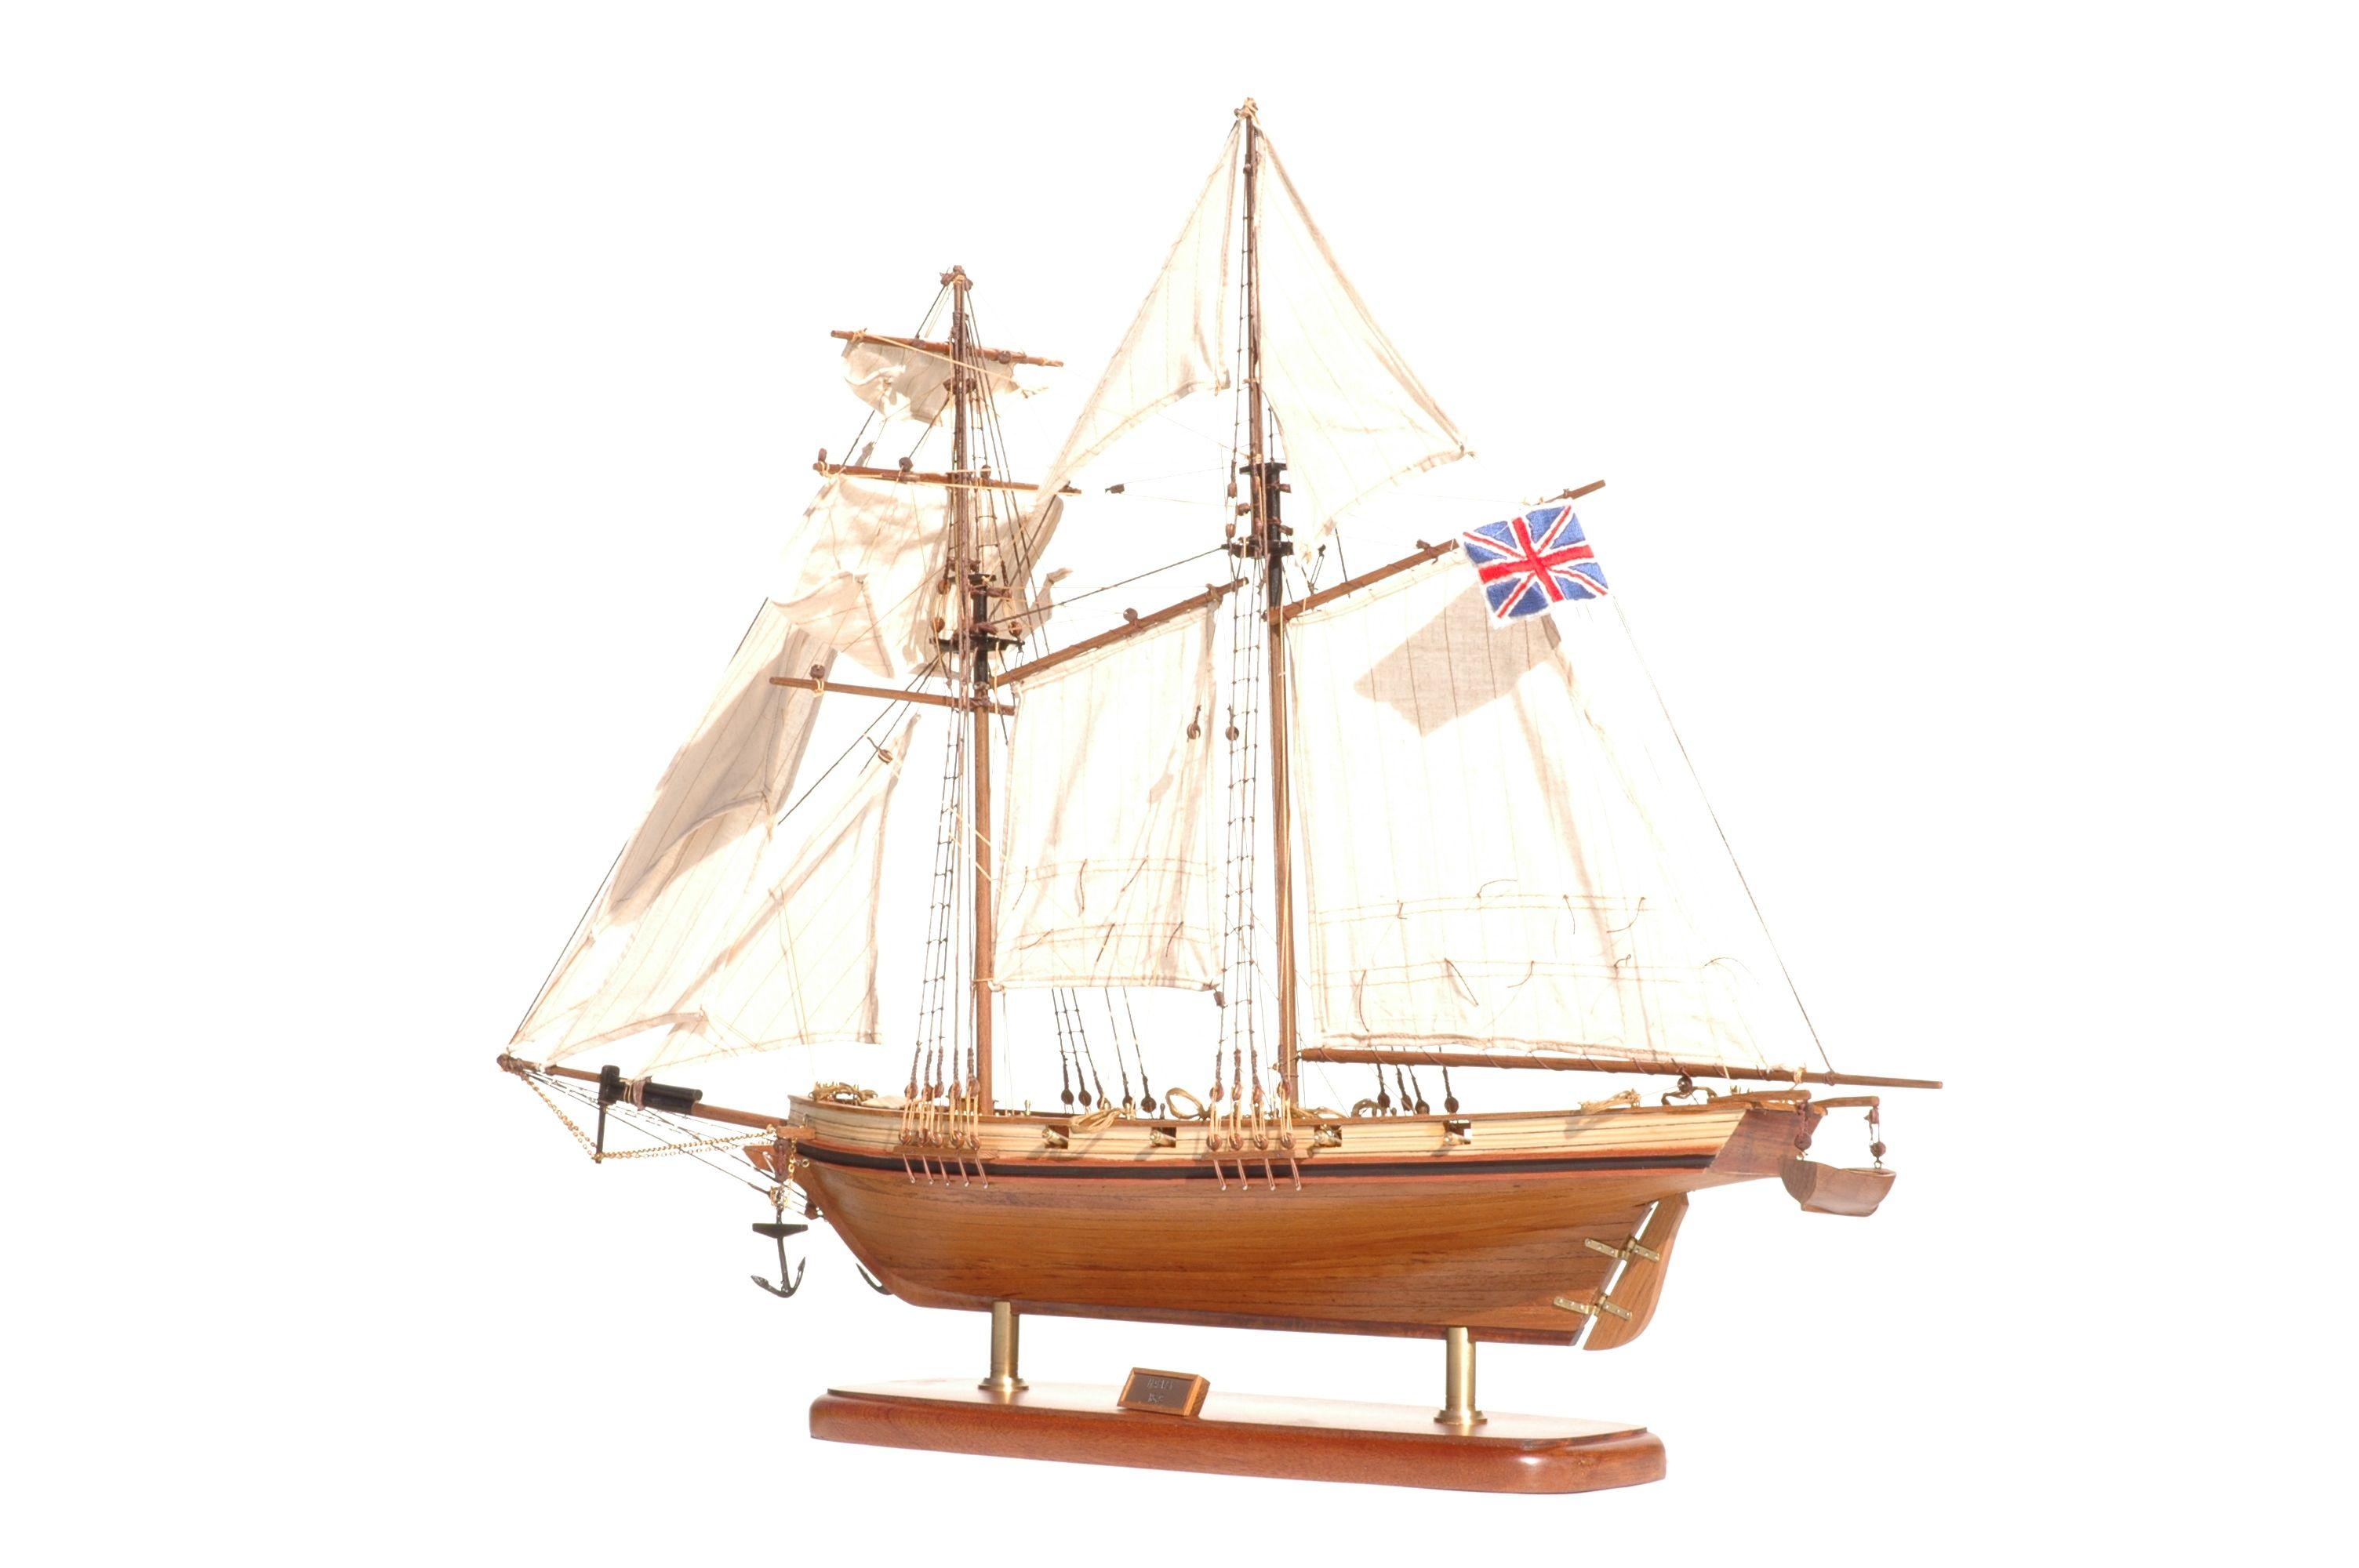 514-8302-Harvey-Model-Boat-Superior-Range